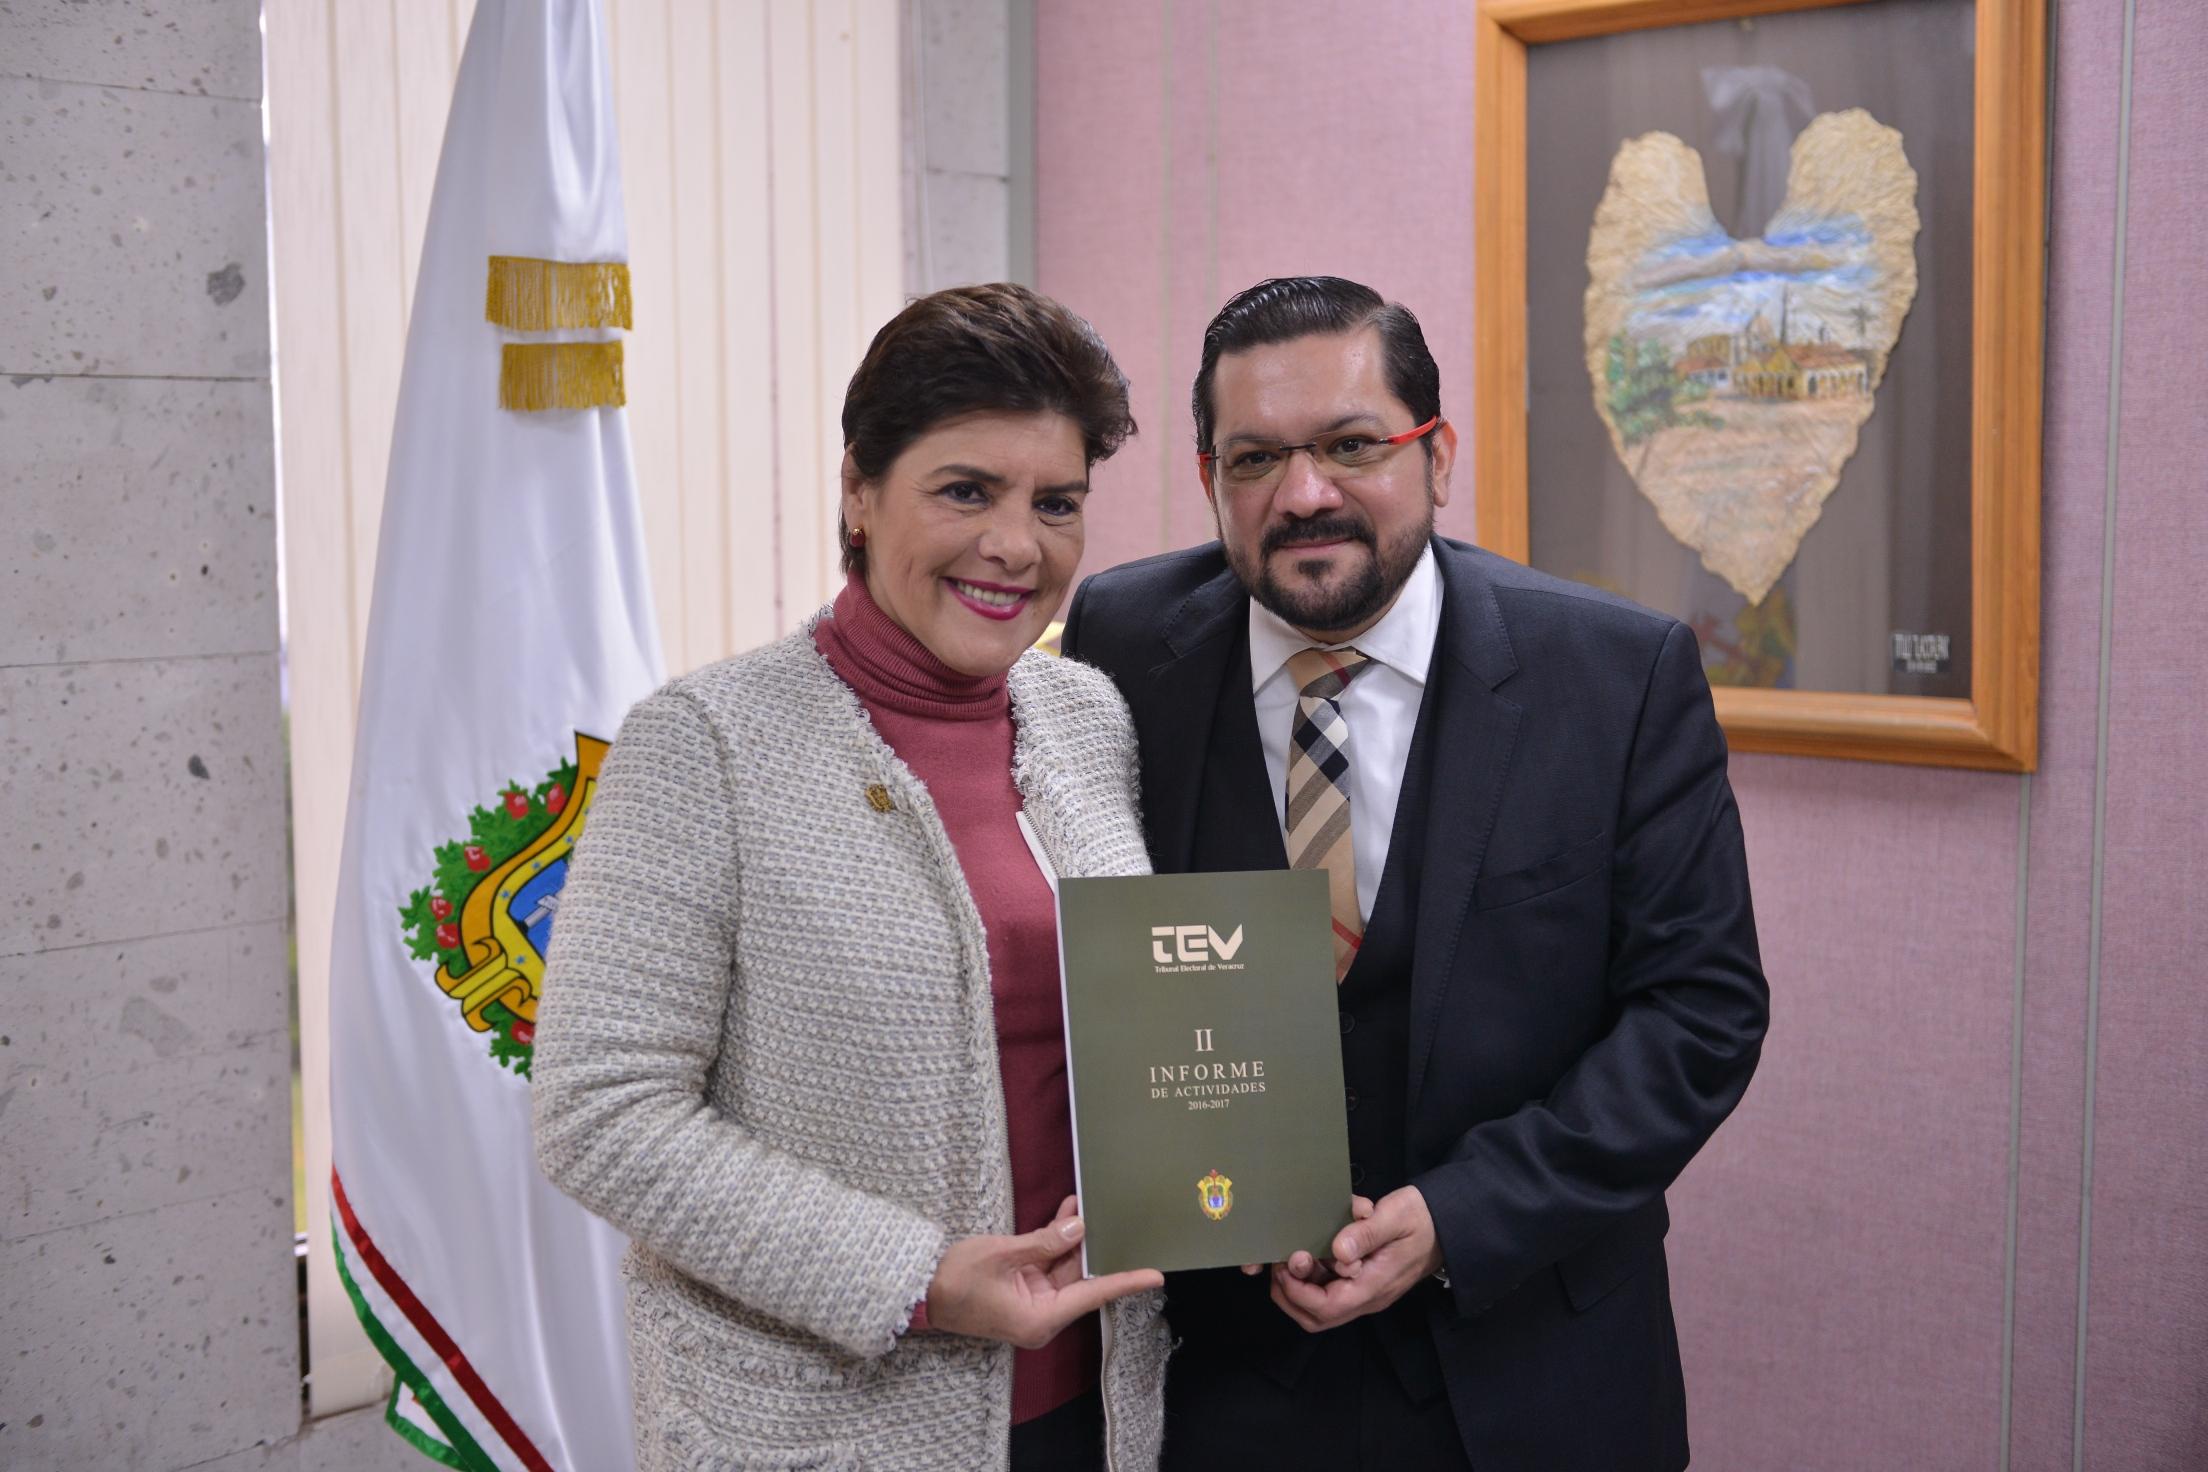 Recibe LXIV Legislatura el Segundo Informe del Tribunal Electoral del Estado